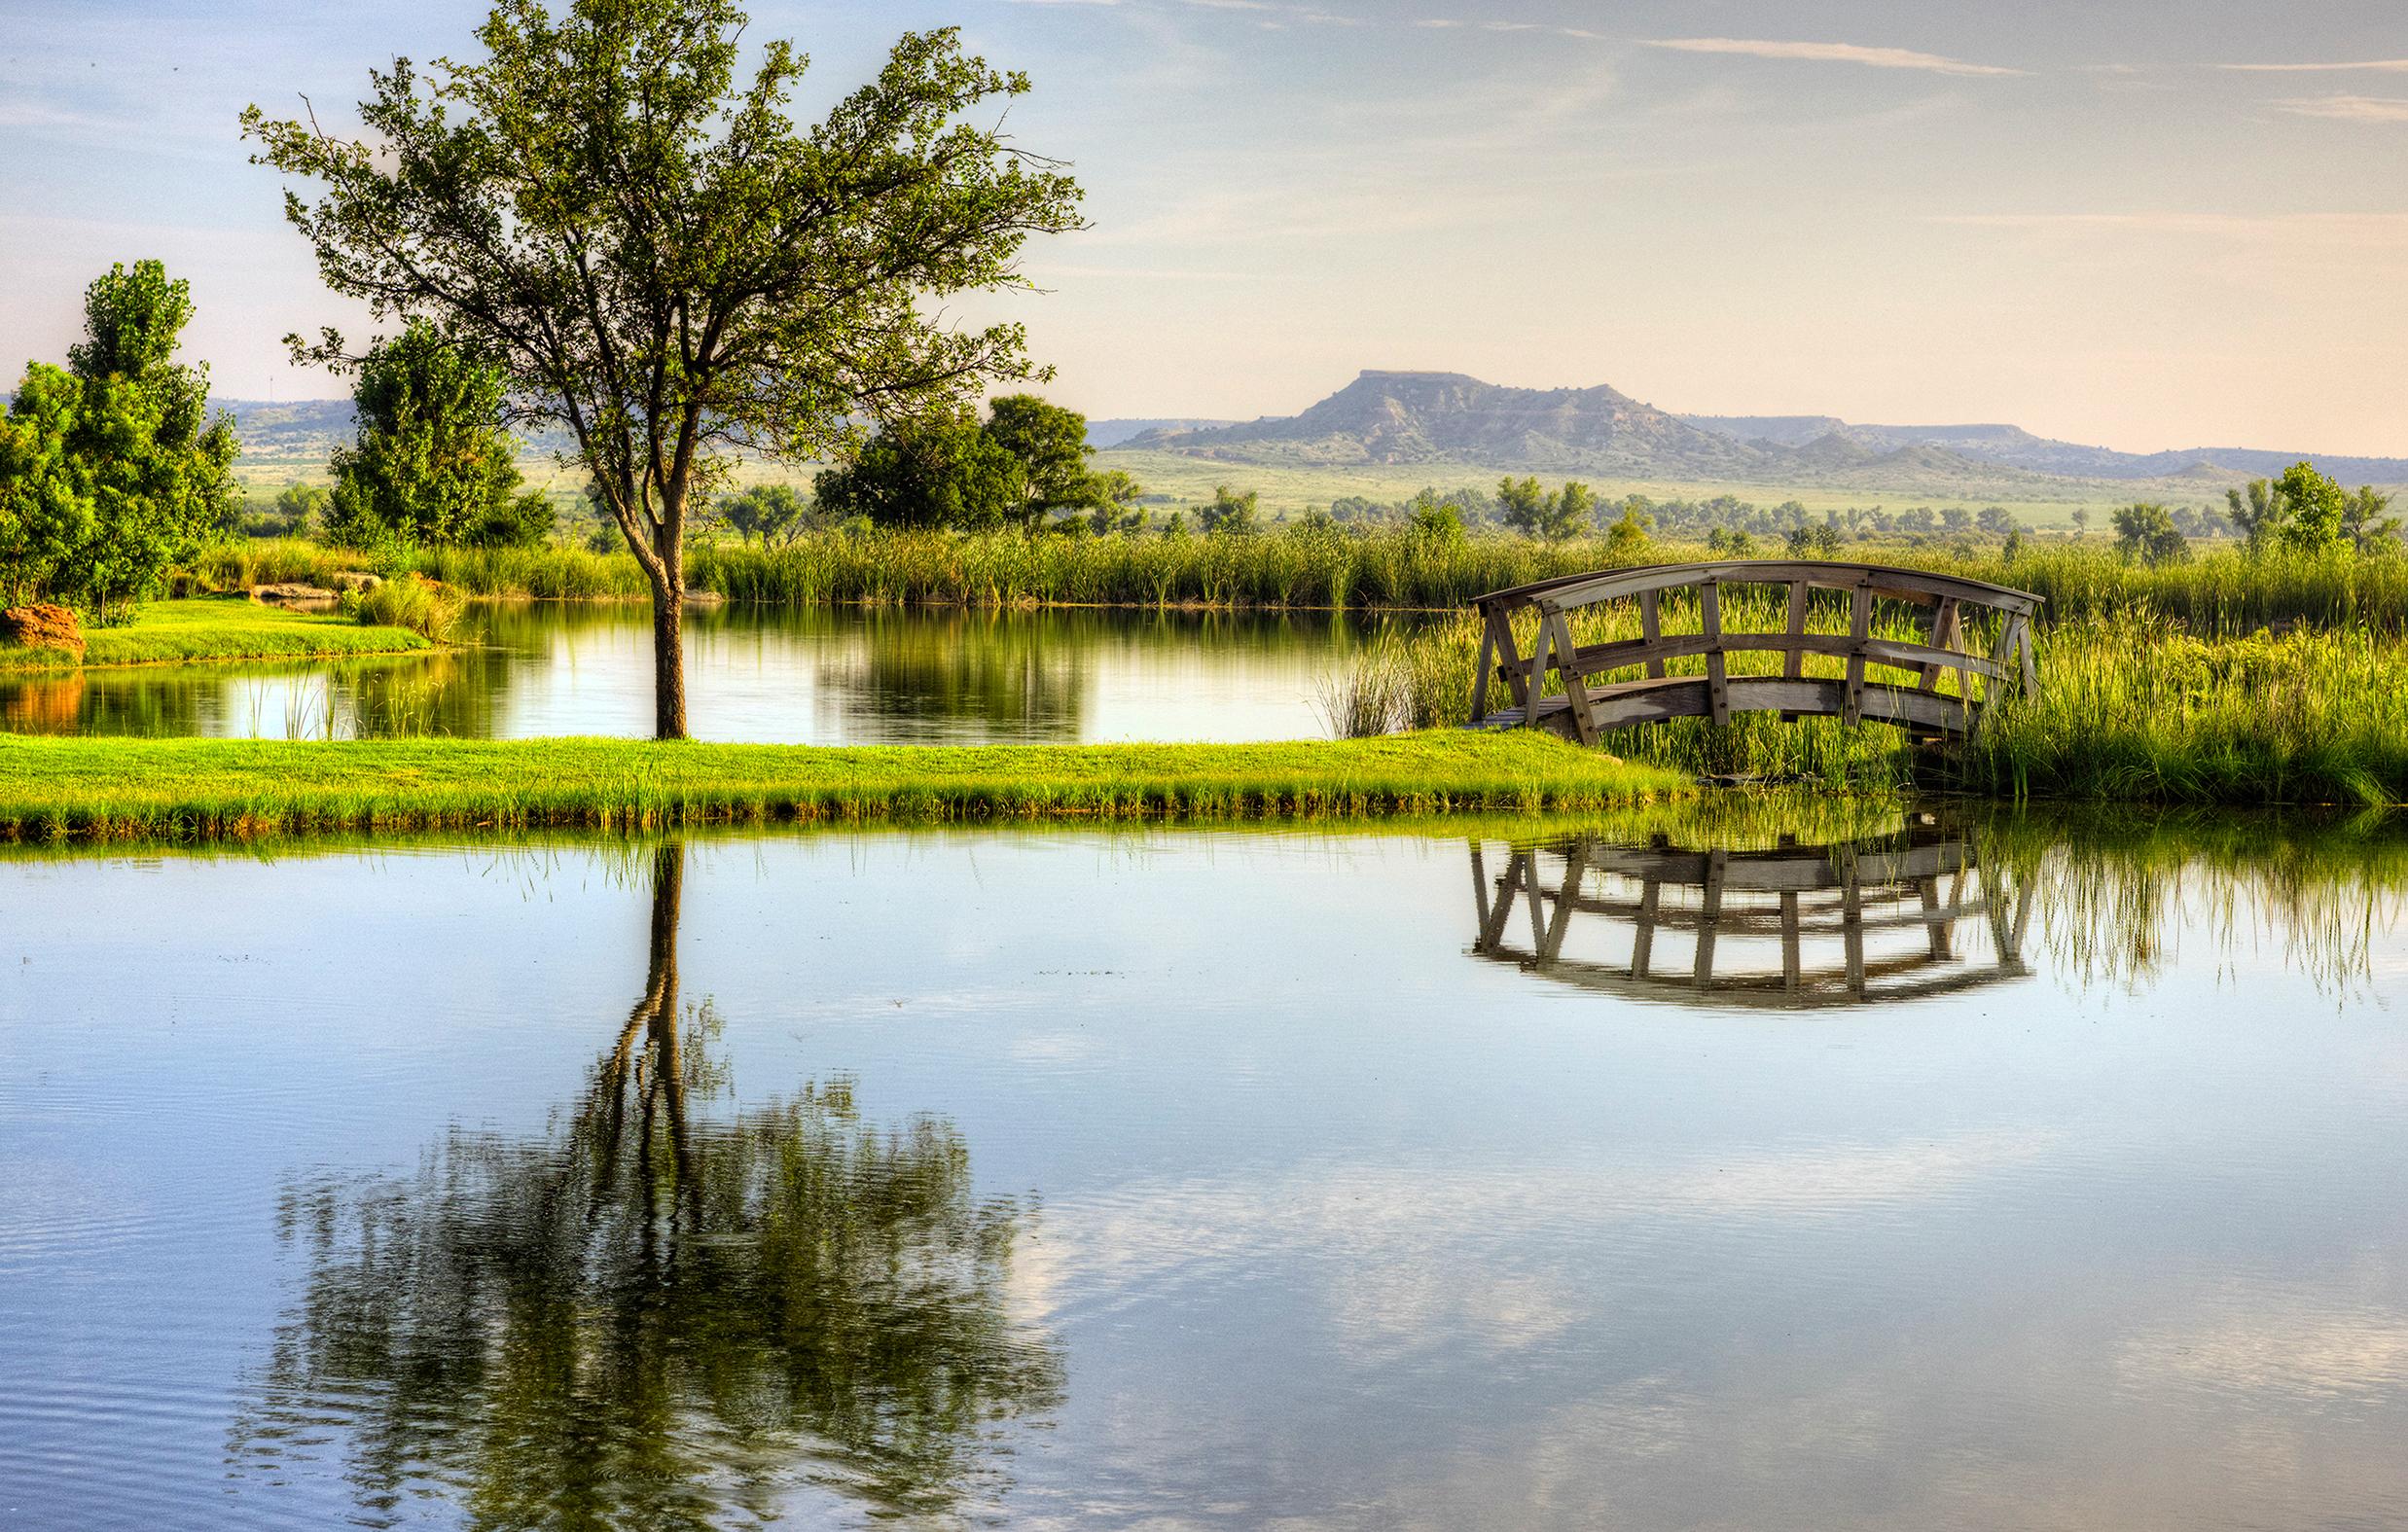 171204-t-boone-pickens-mesa-vista-ranch-13